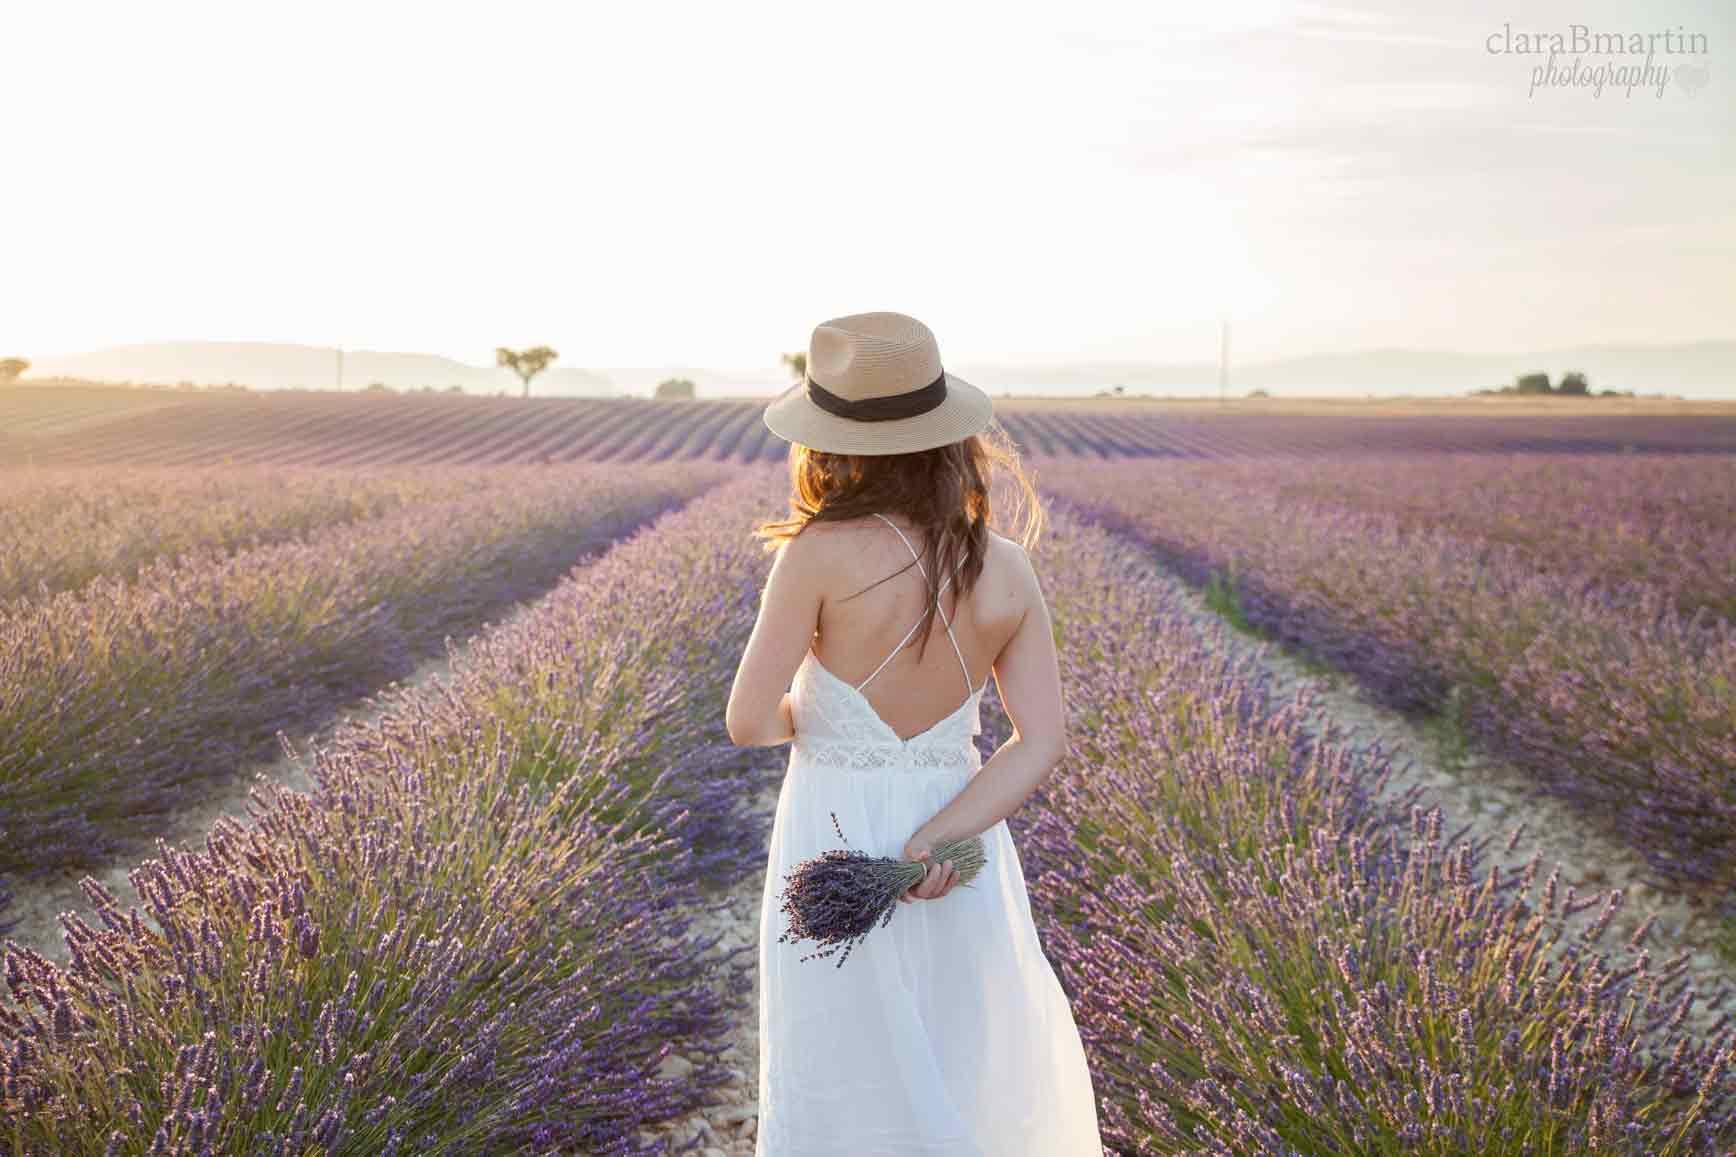 Lavender-fields-Provence-claraBmartin08